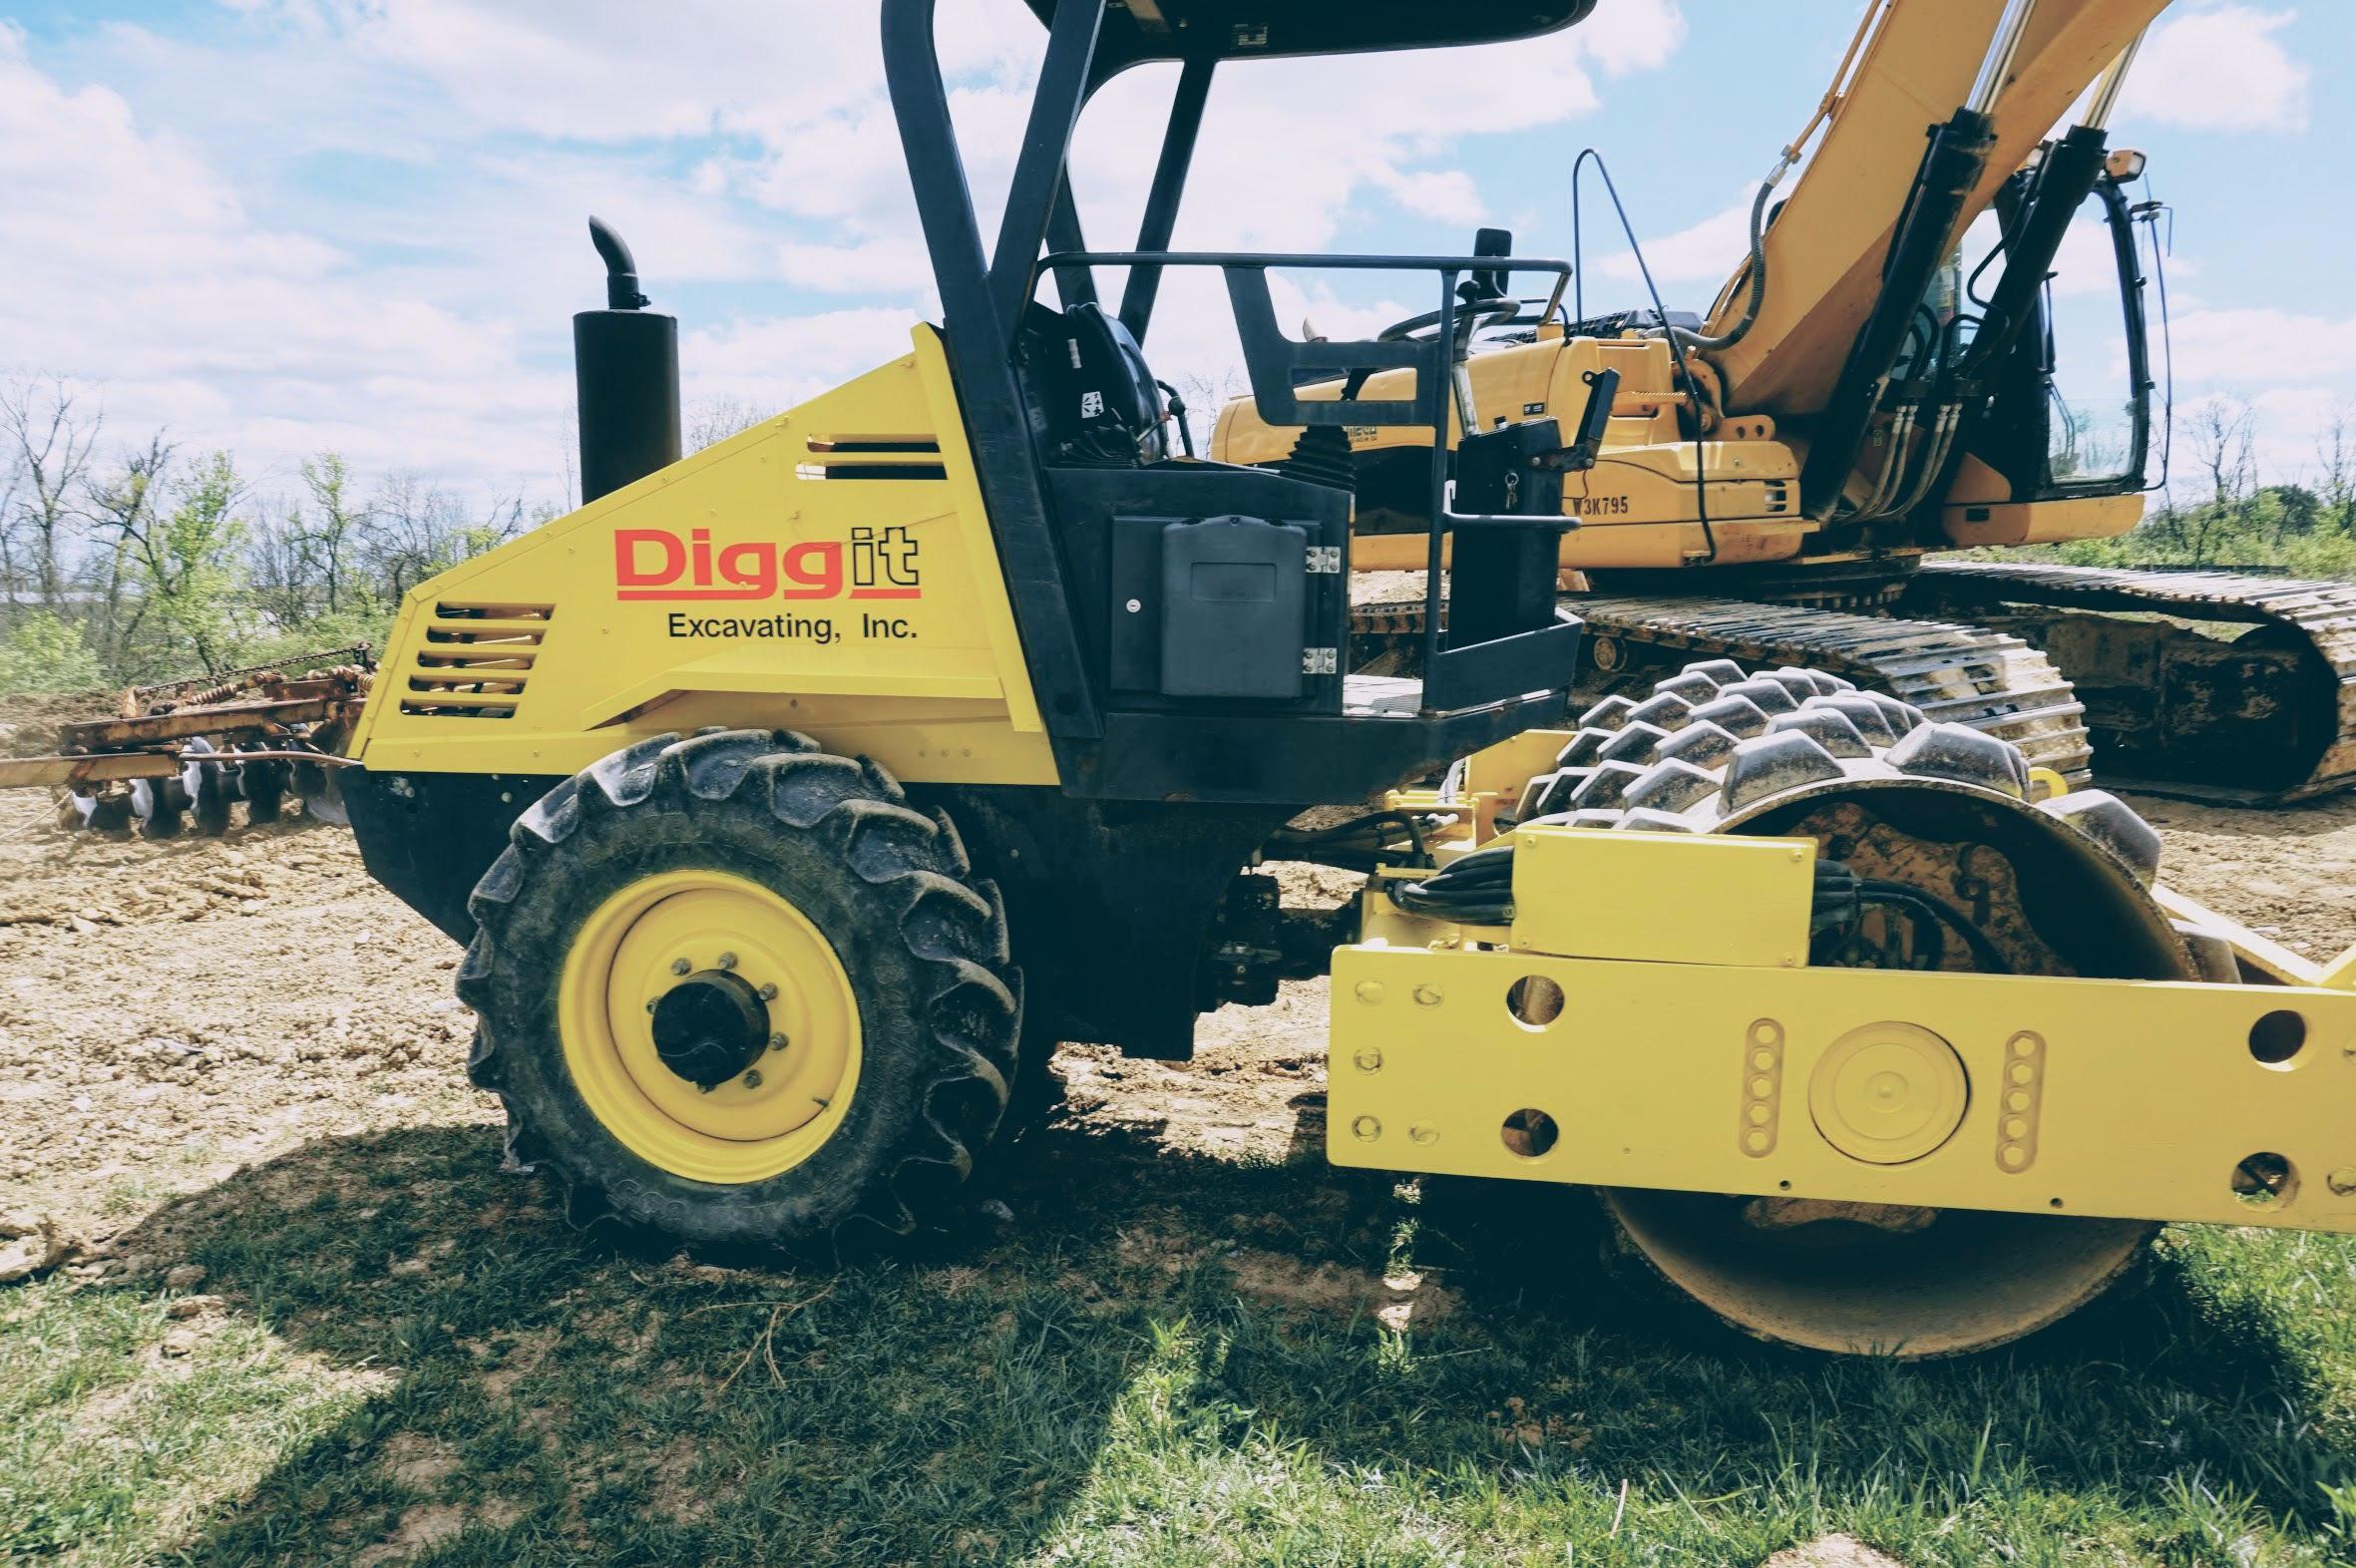 Demolition Services - Construction Site Demolition Contractors